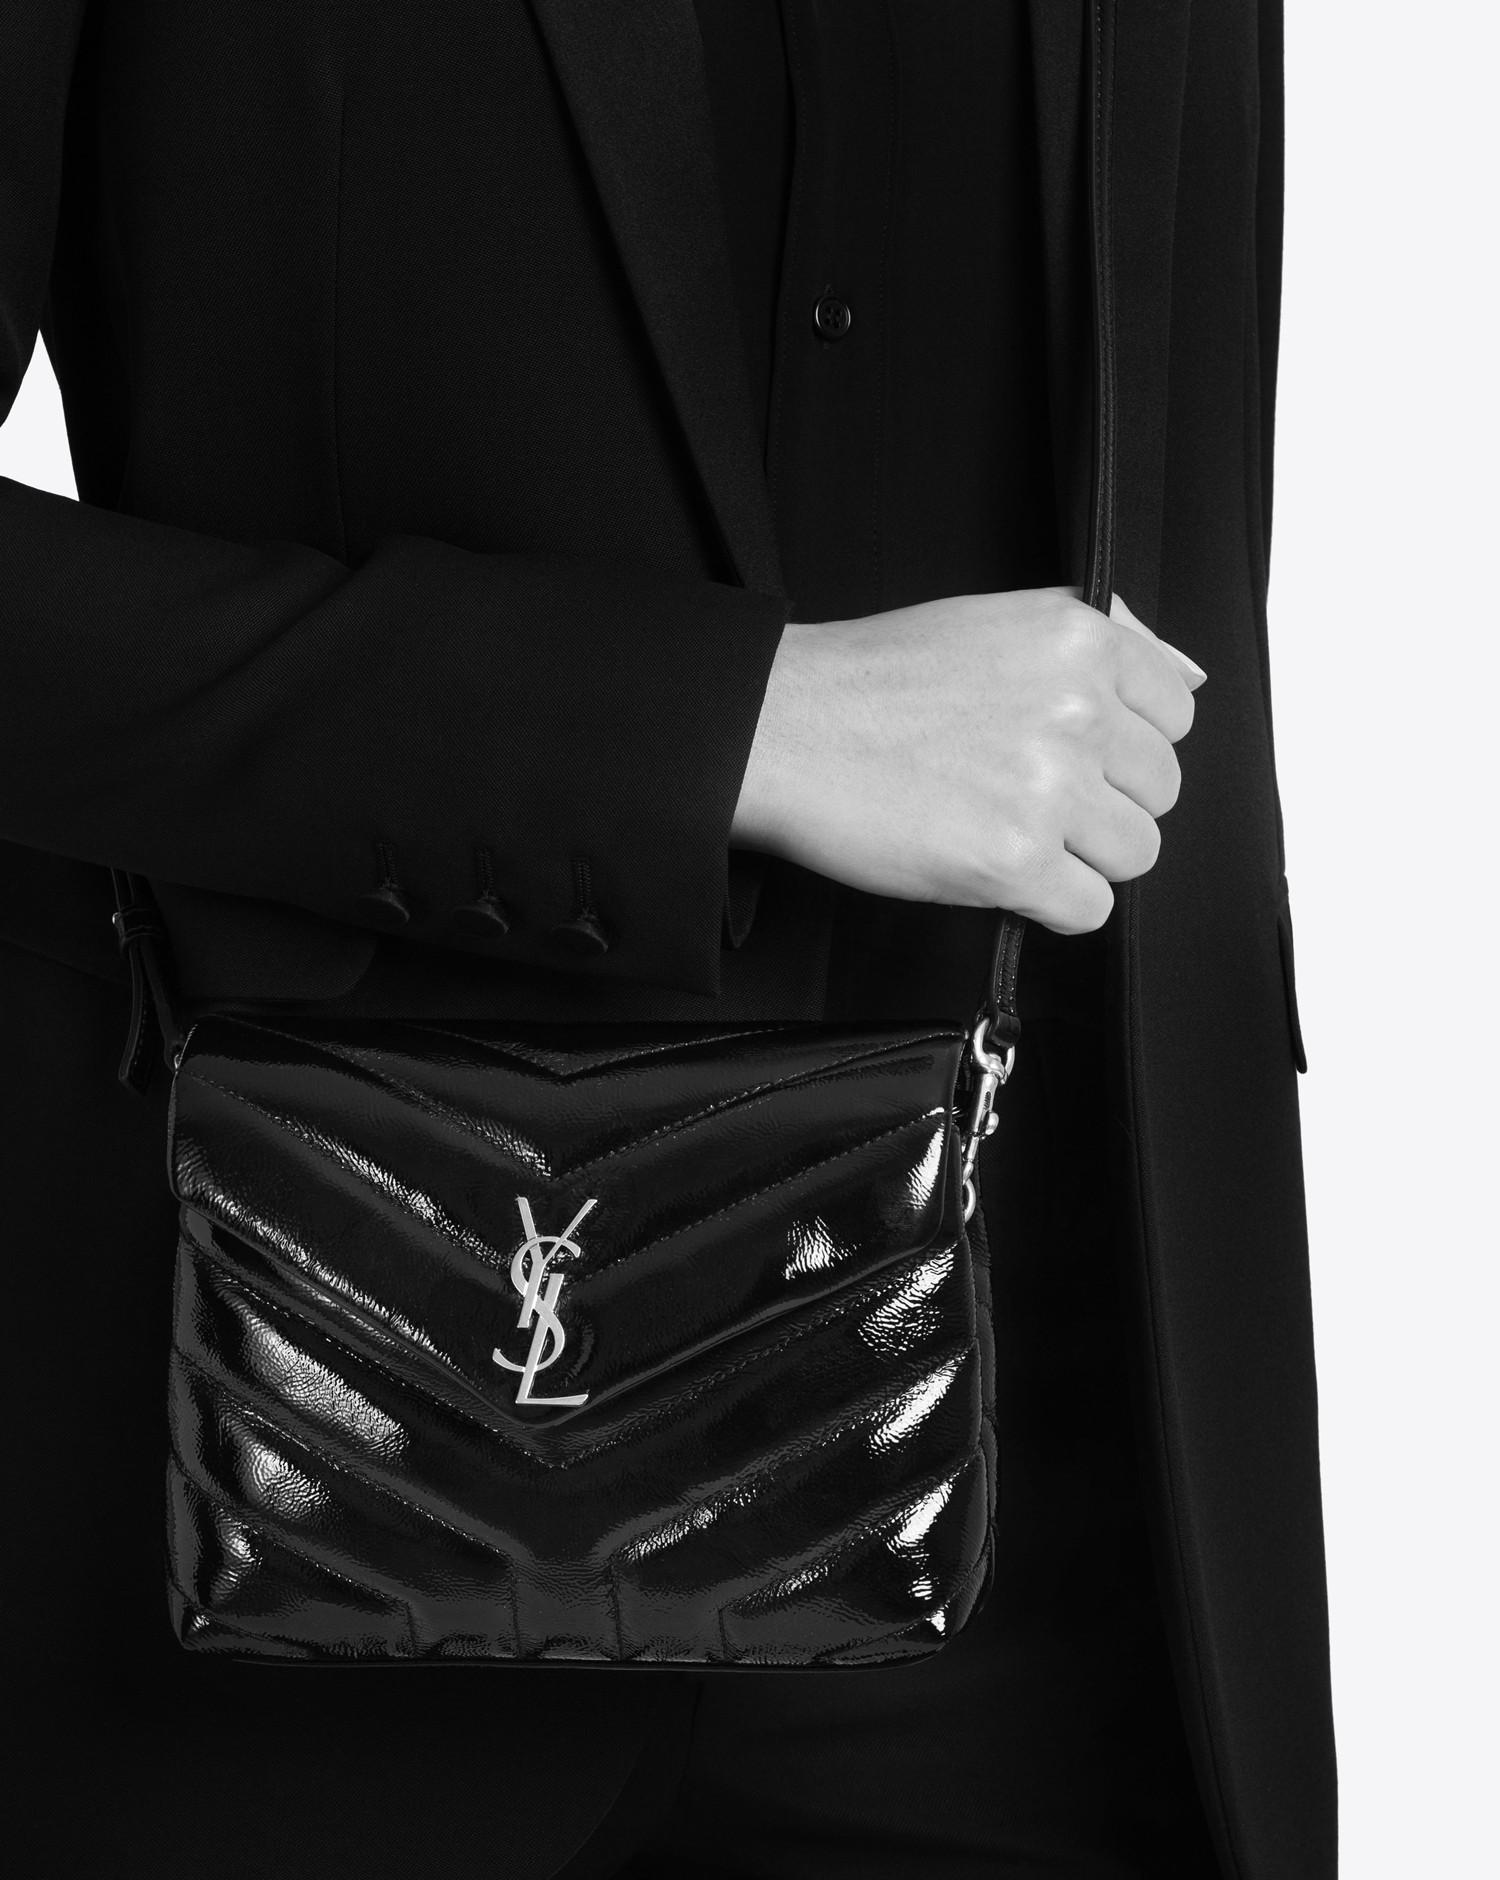 ac64e40554 Lyst - Saint Laurent Toy Loulou Strap Bag In Black